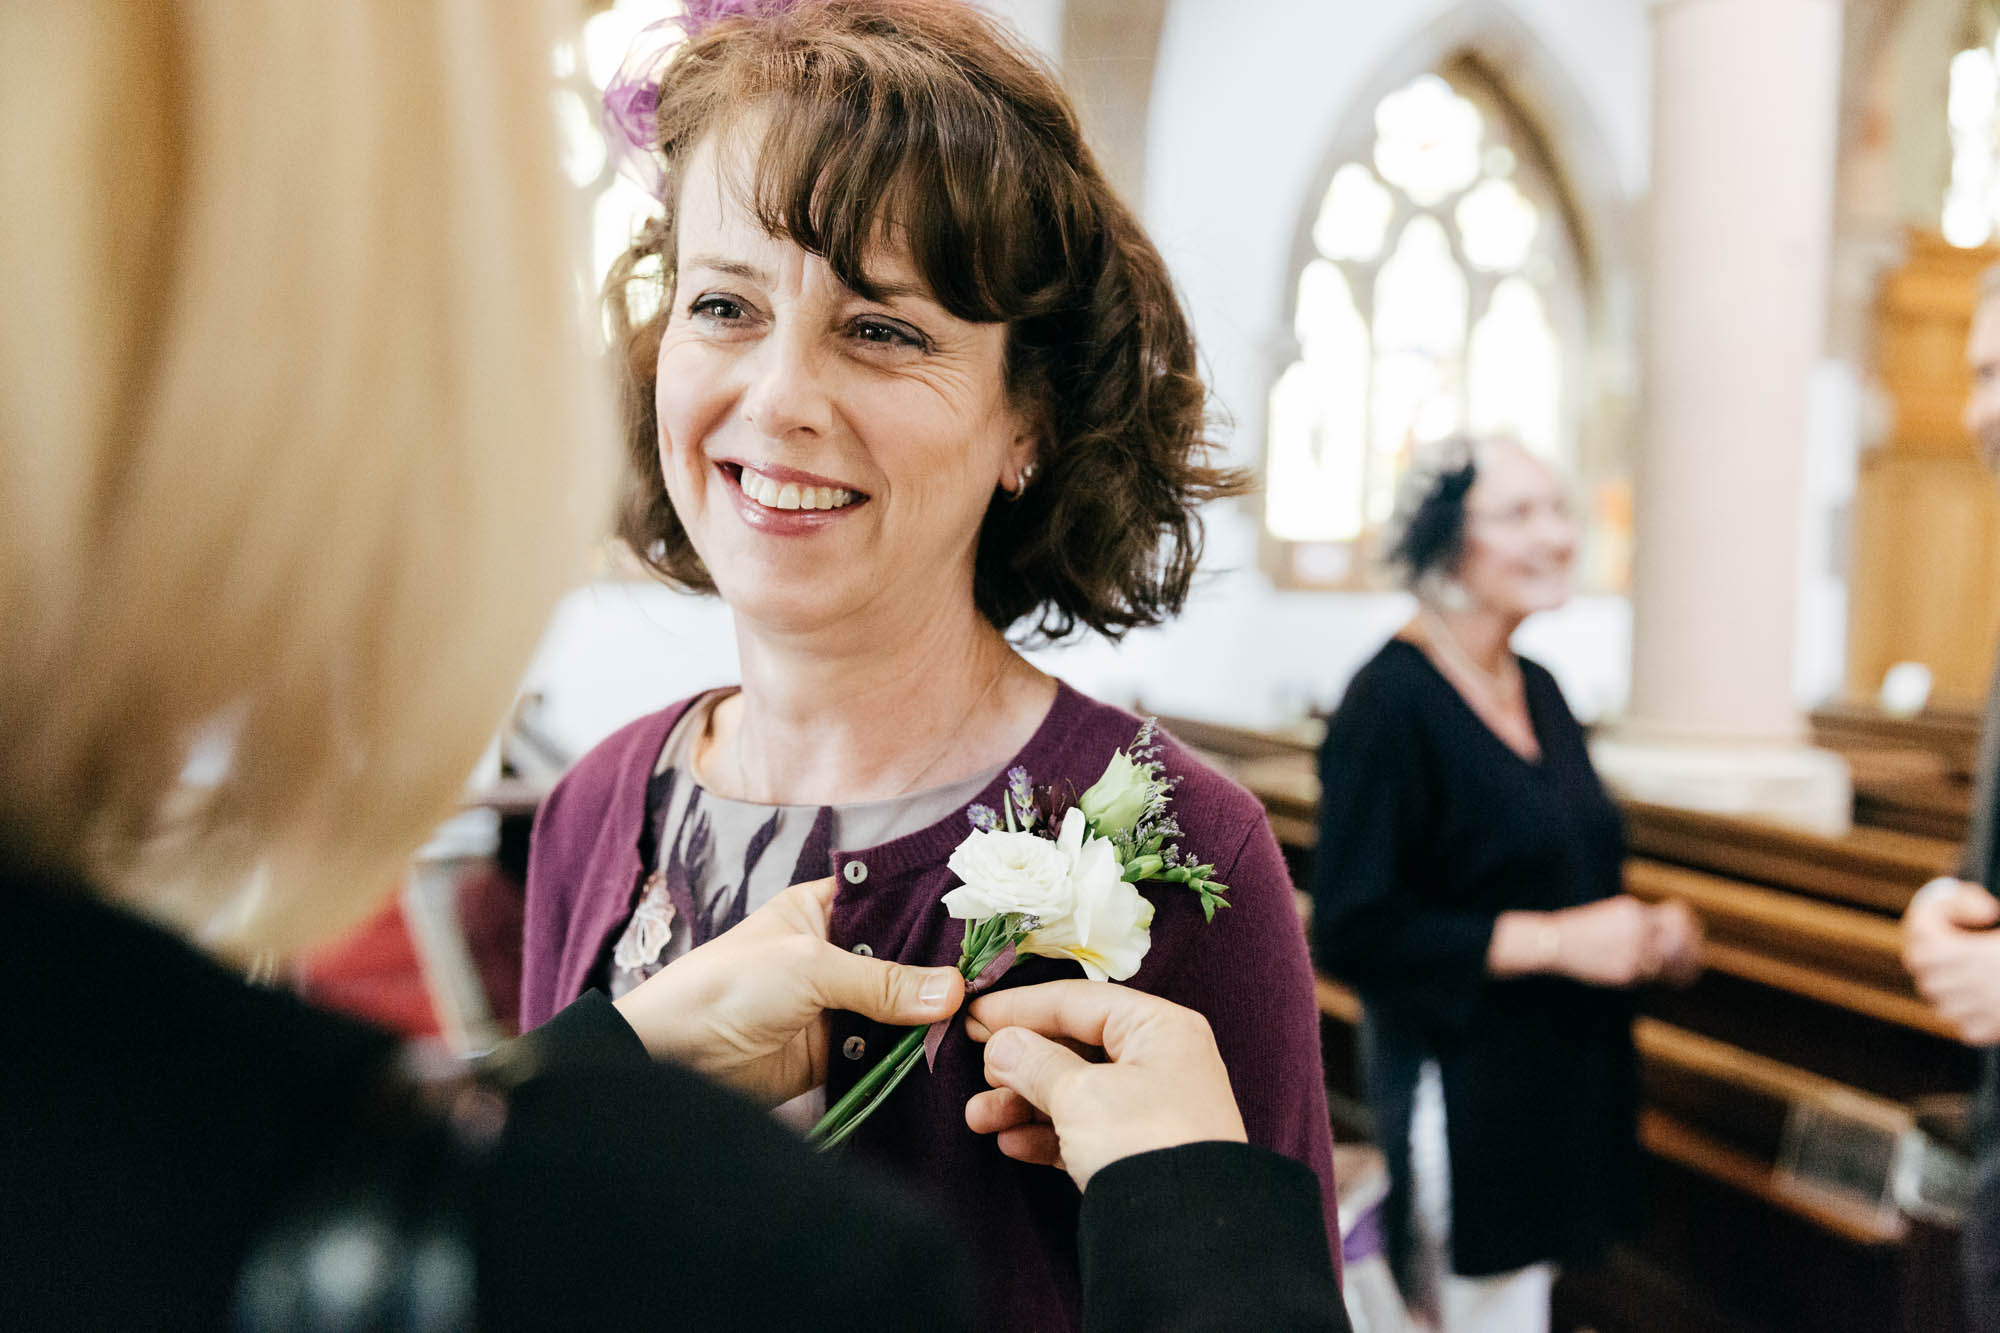 Joan & Andrew's harrogate wedding photography by Gloucestershire wedding photographer Amber Marie Photography